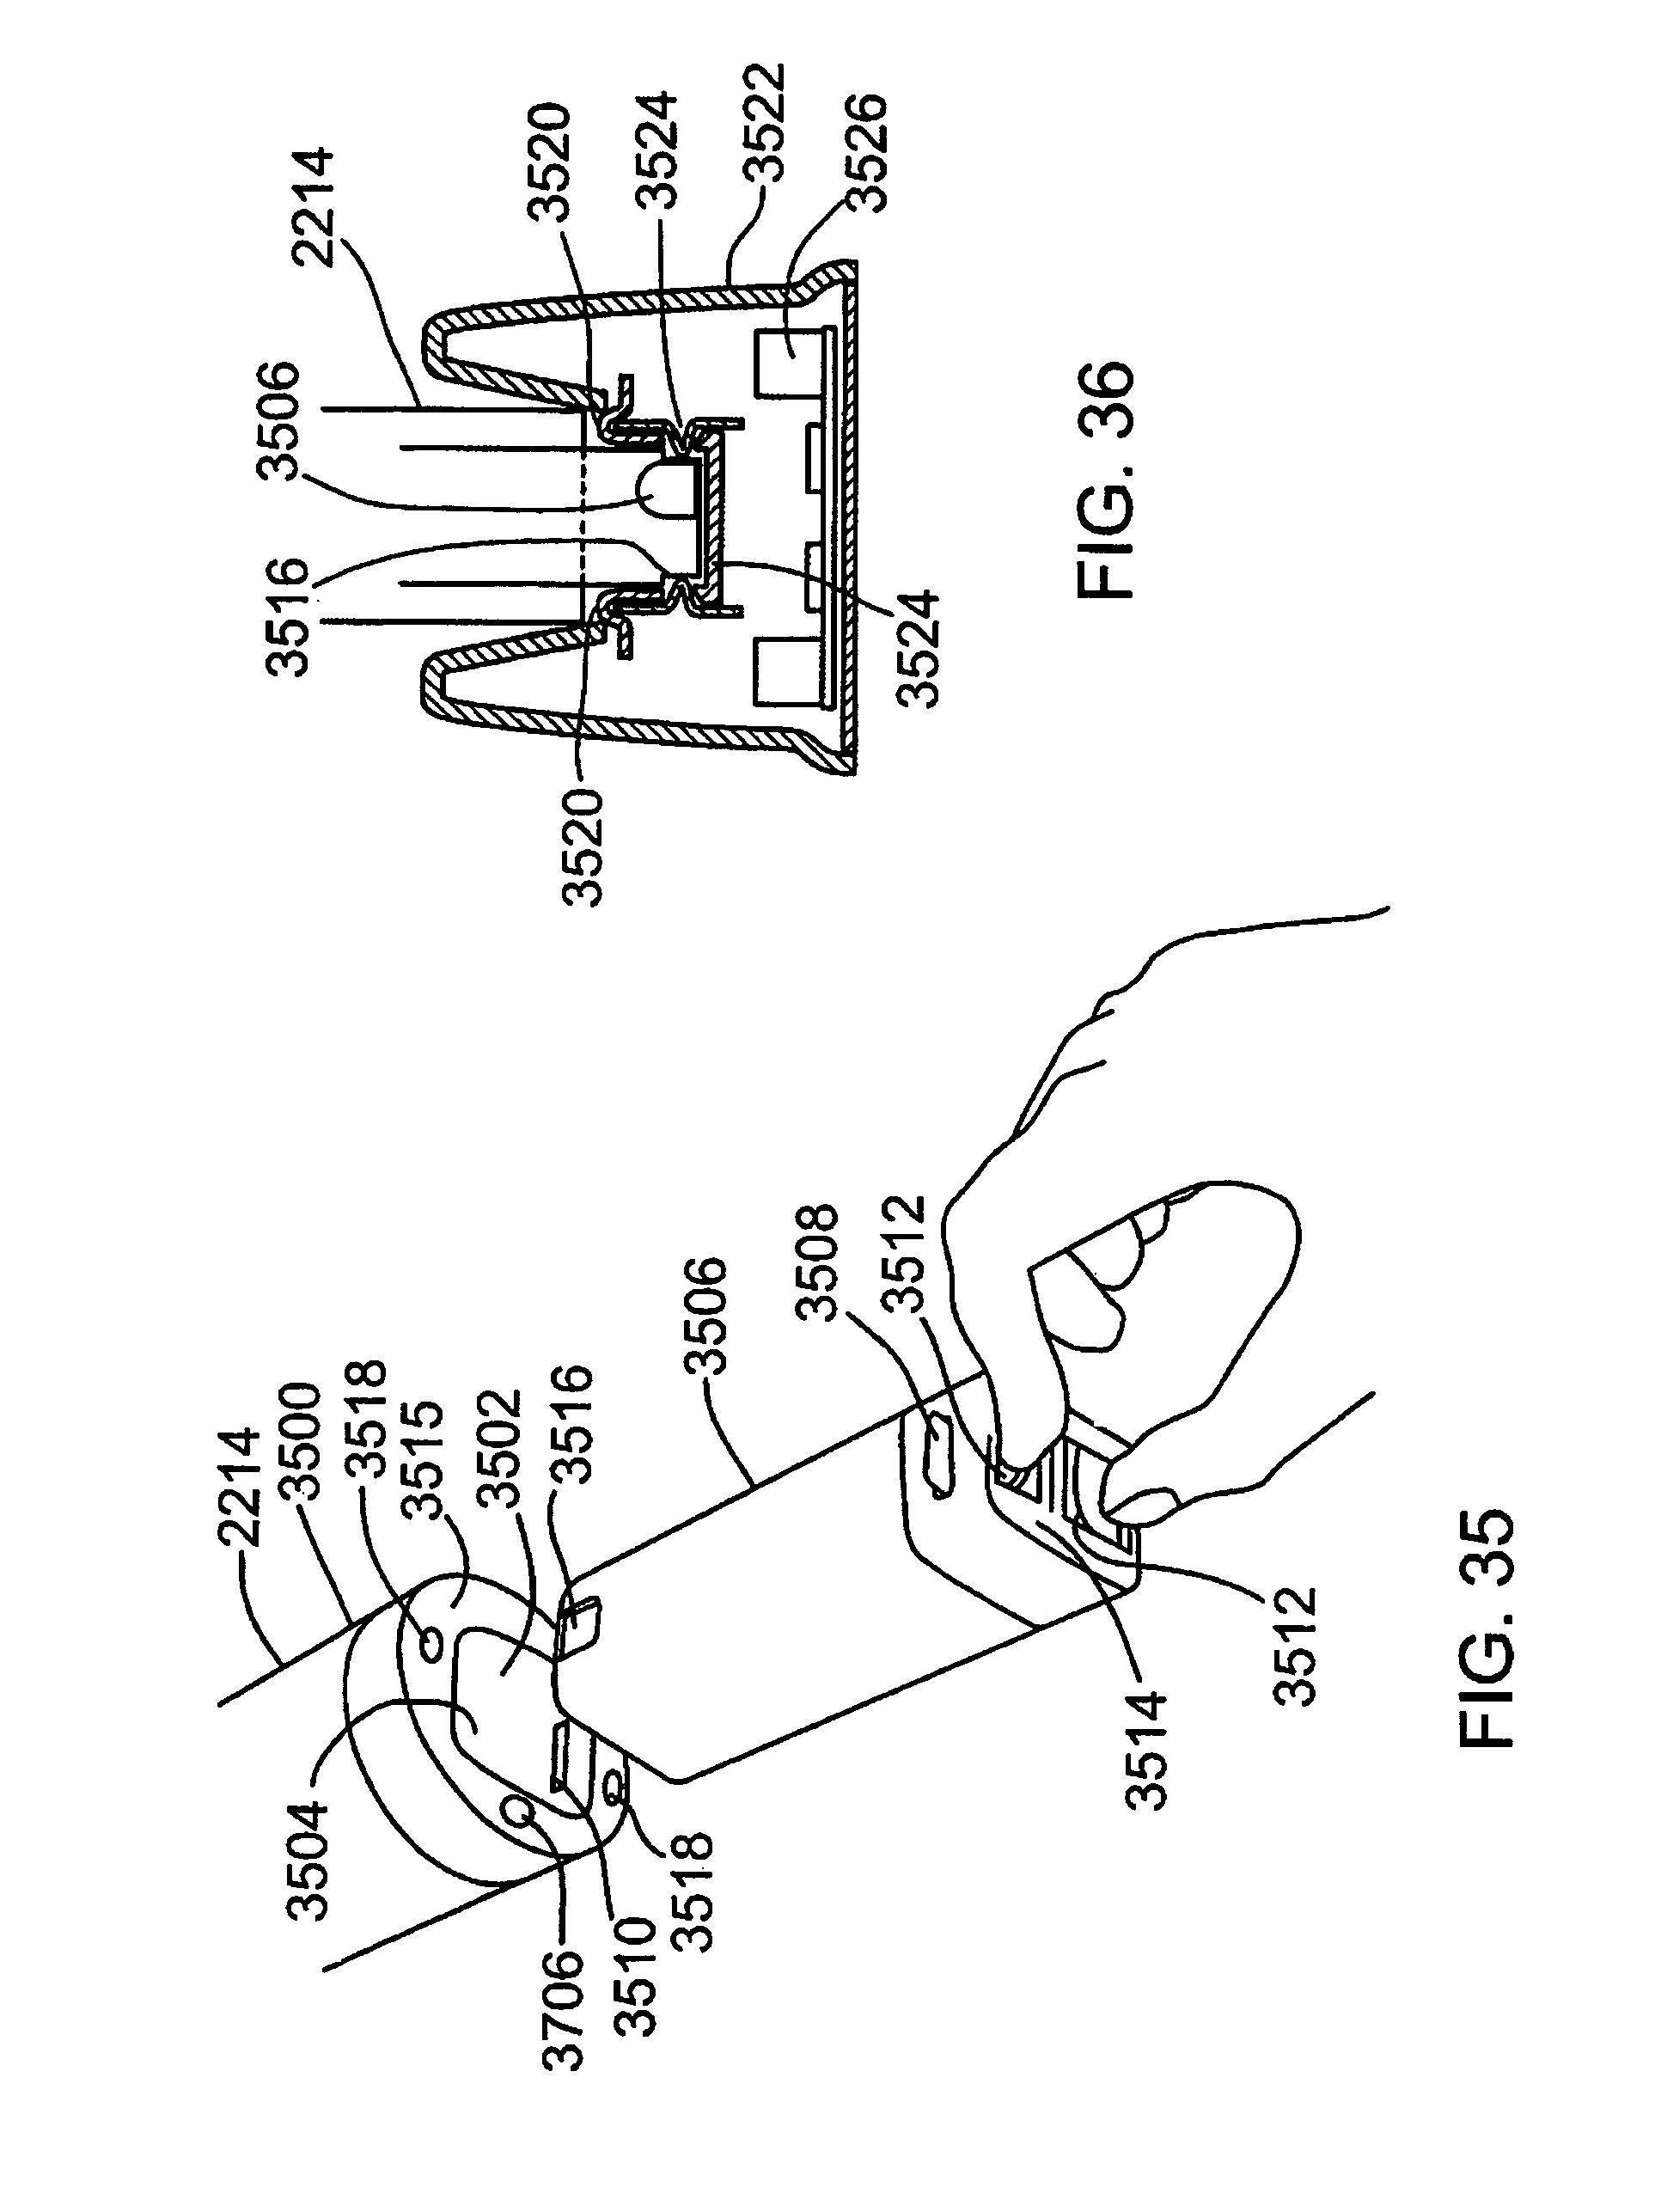 Bodine emergency ballast wiring diagram » installing electrical